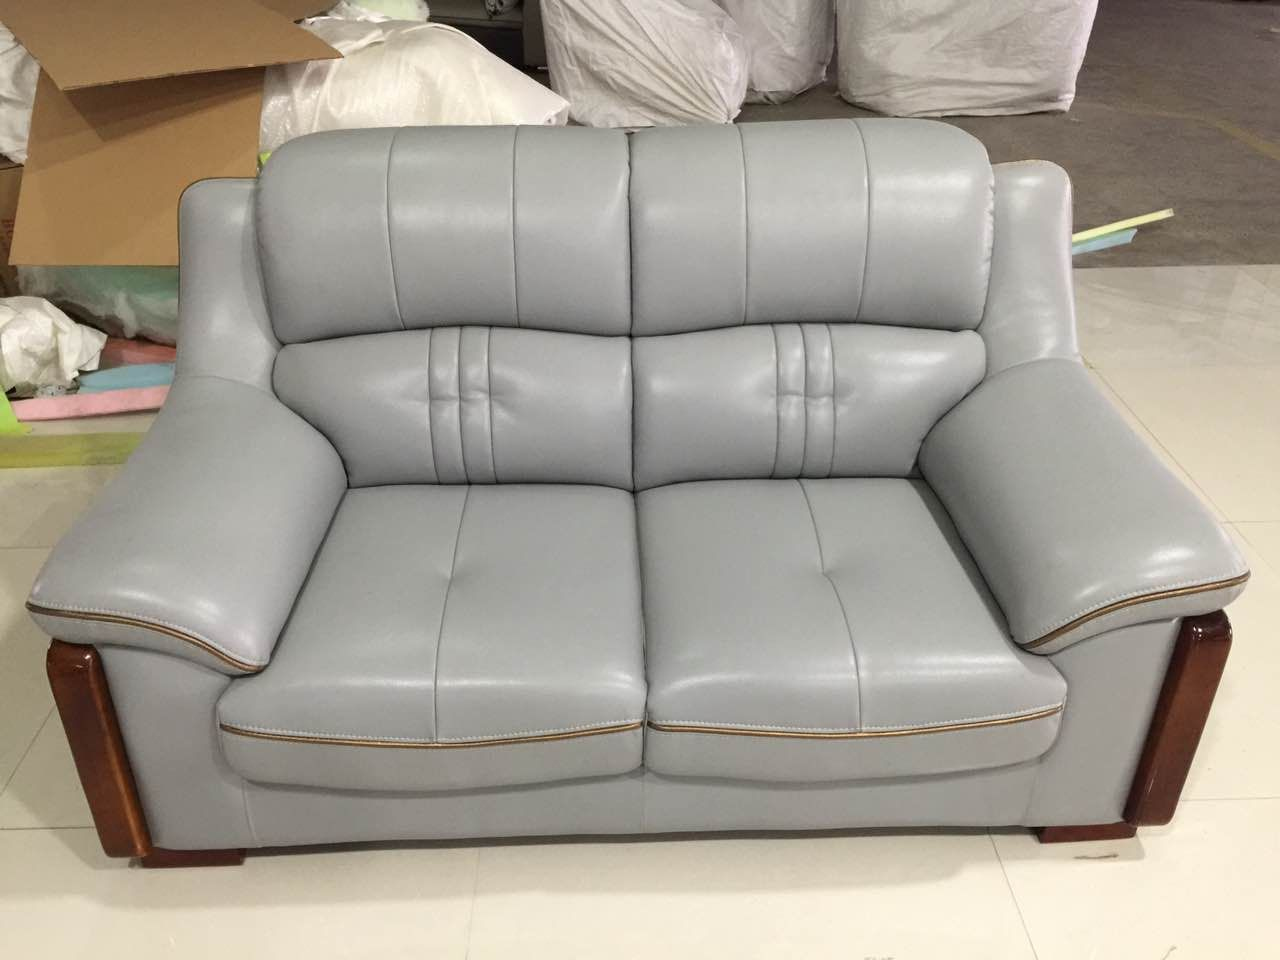 China Style Genuine Leather Two Seater Luxury Furniture Sofa Modern Furniture Living Room Corner Sofa Design